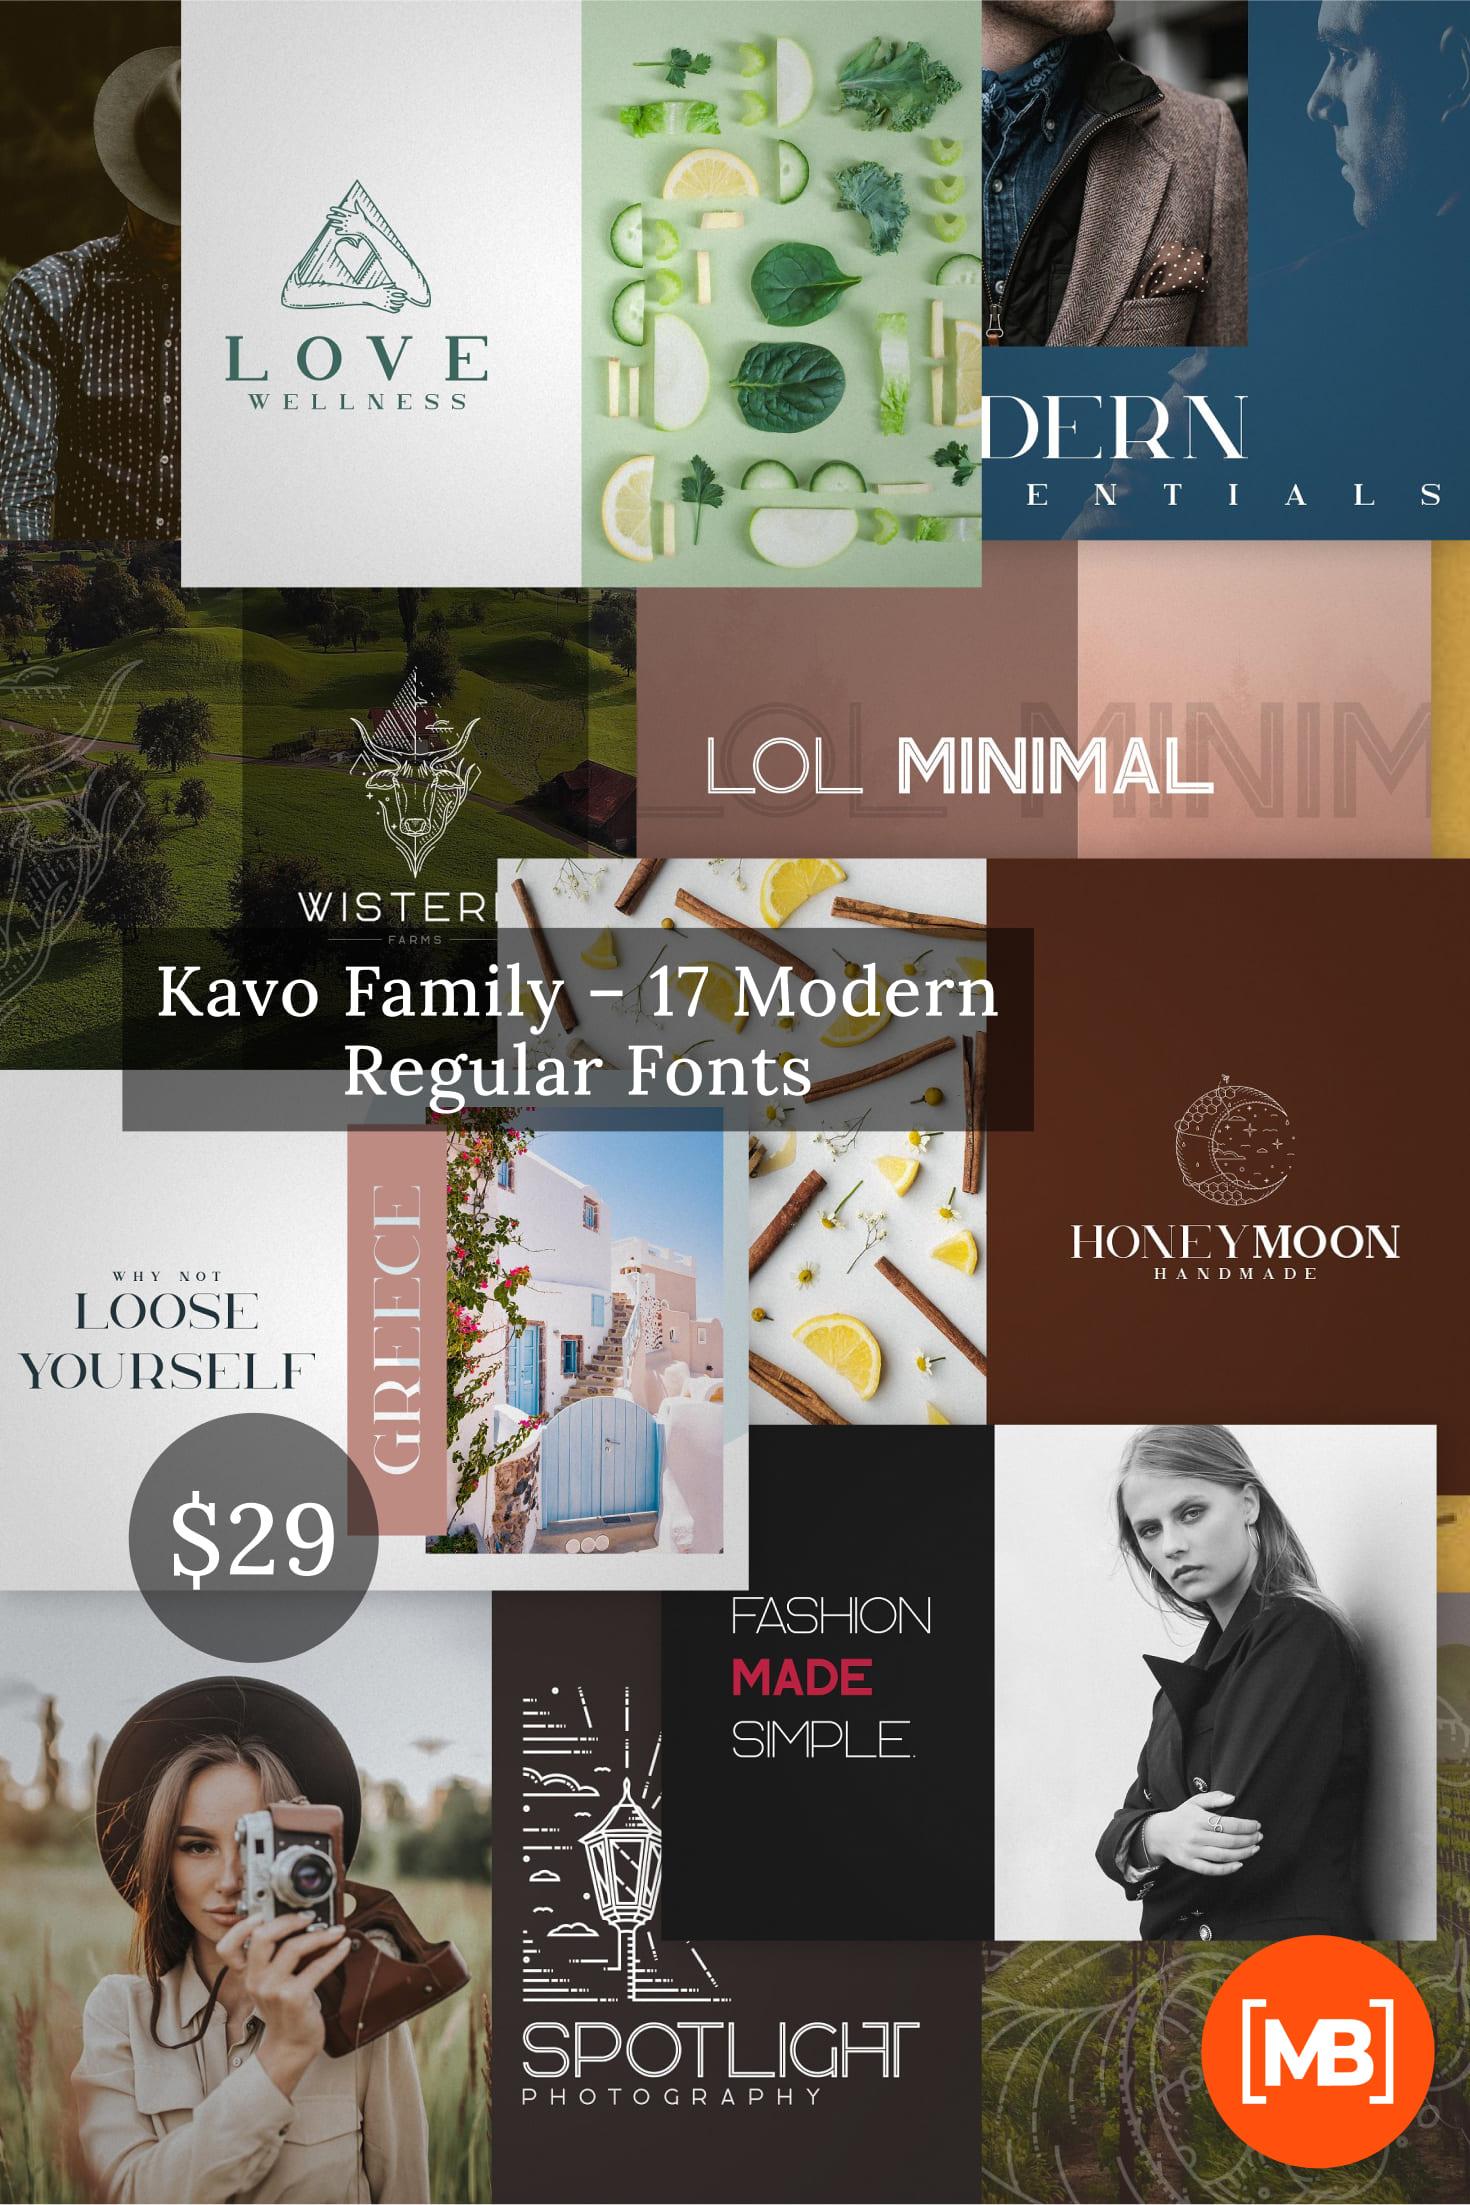 Pinterest Image: Kavo Family - 17 Modern Regular Fonts + 24 logos.